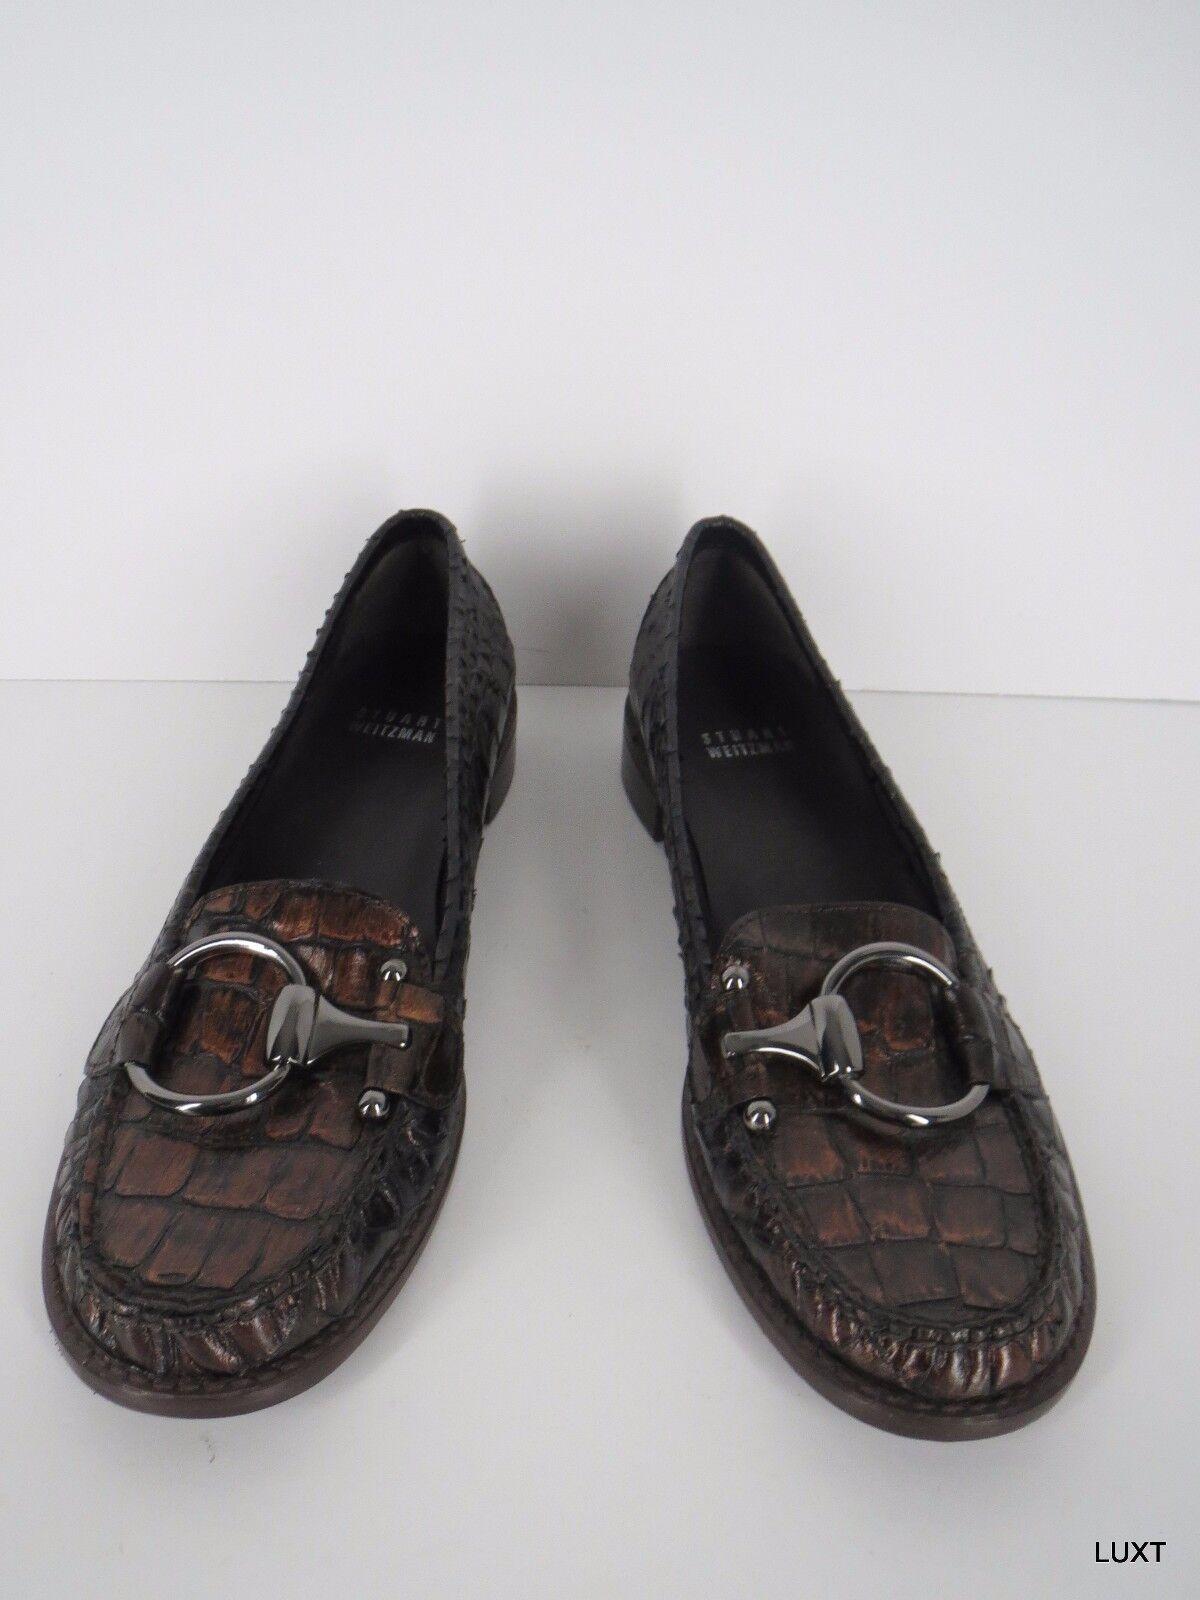 Stuart Weitzman Loafers 7.5 N Patent Leather Brown Metallic Crocodile Horse Bit